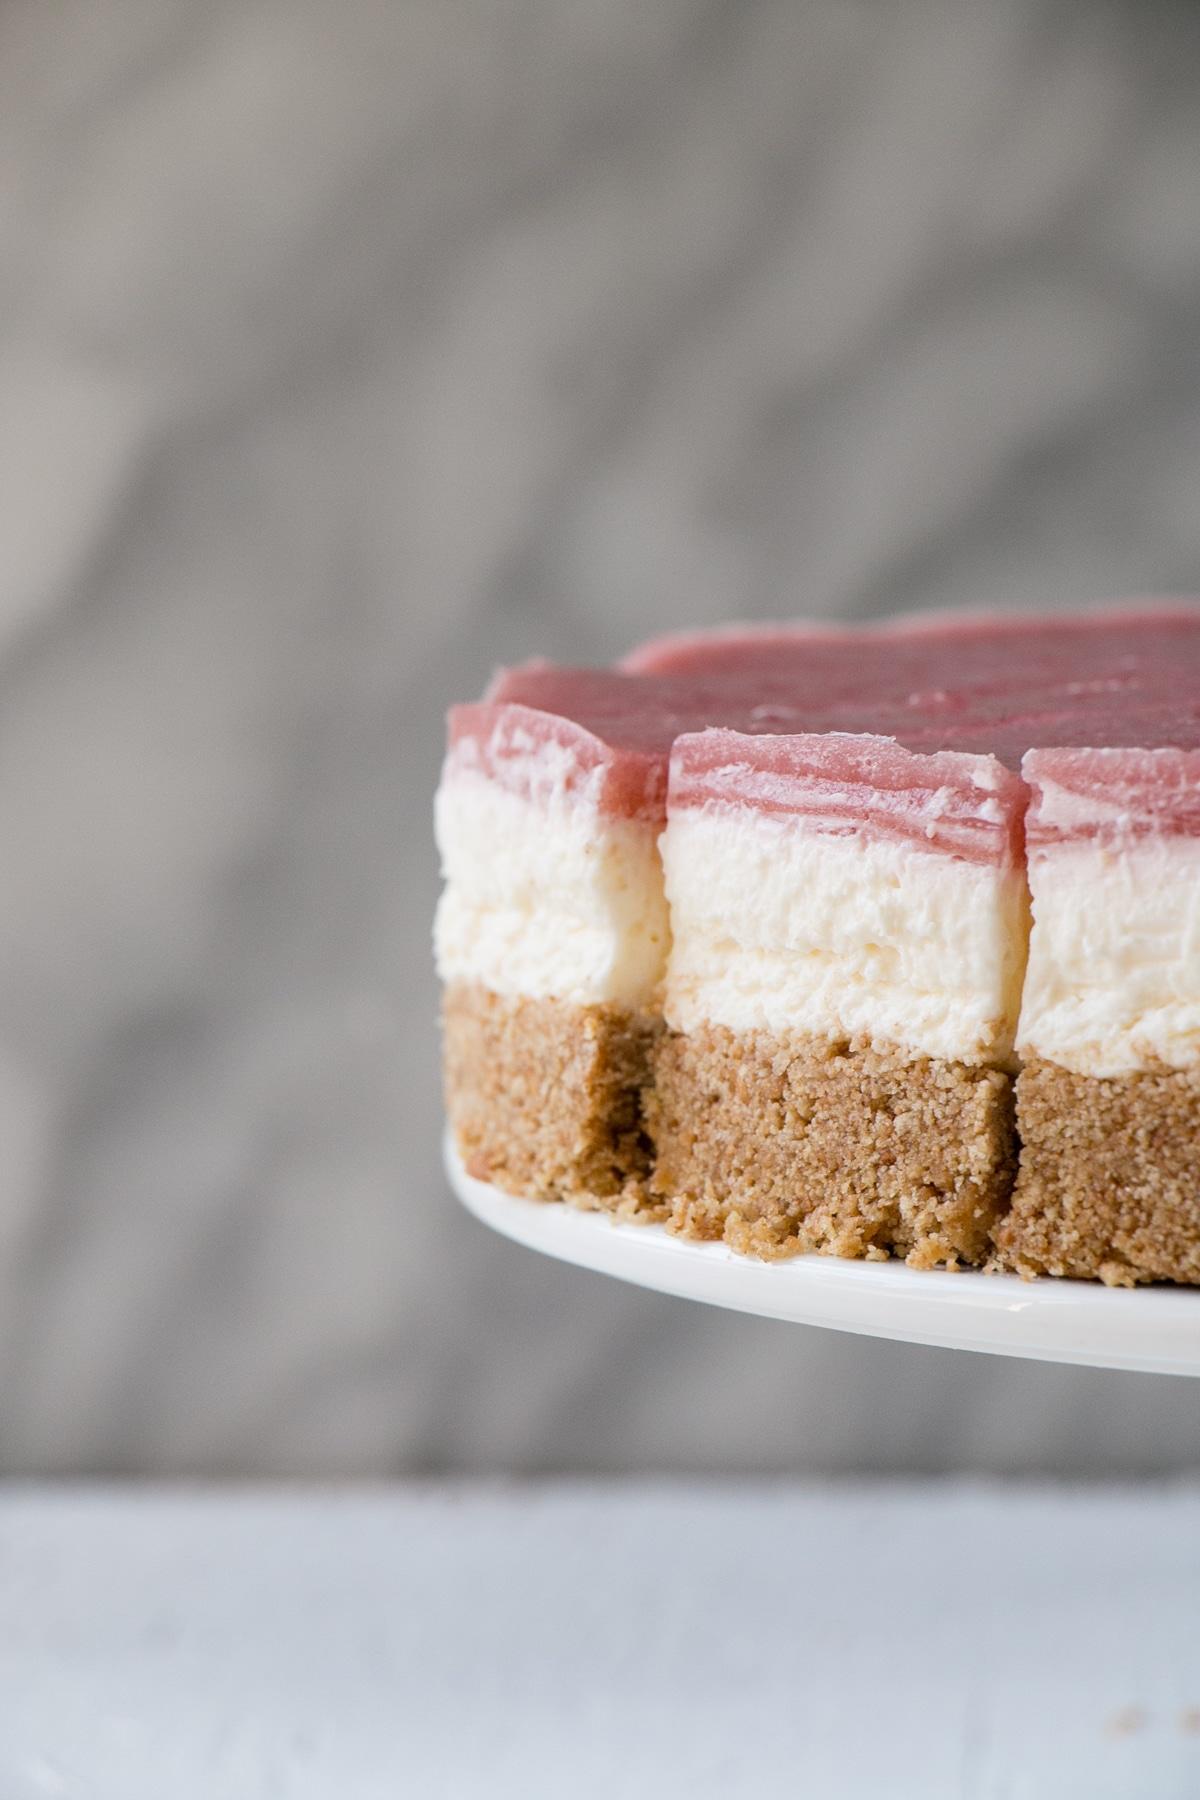 side angle photo showing layers of a No Bake Rhubarb Cheesecake